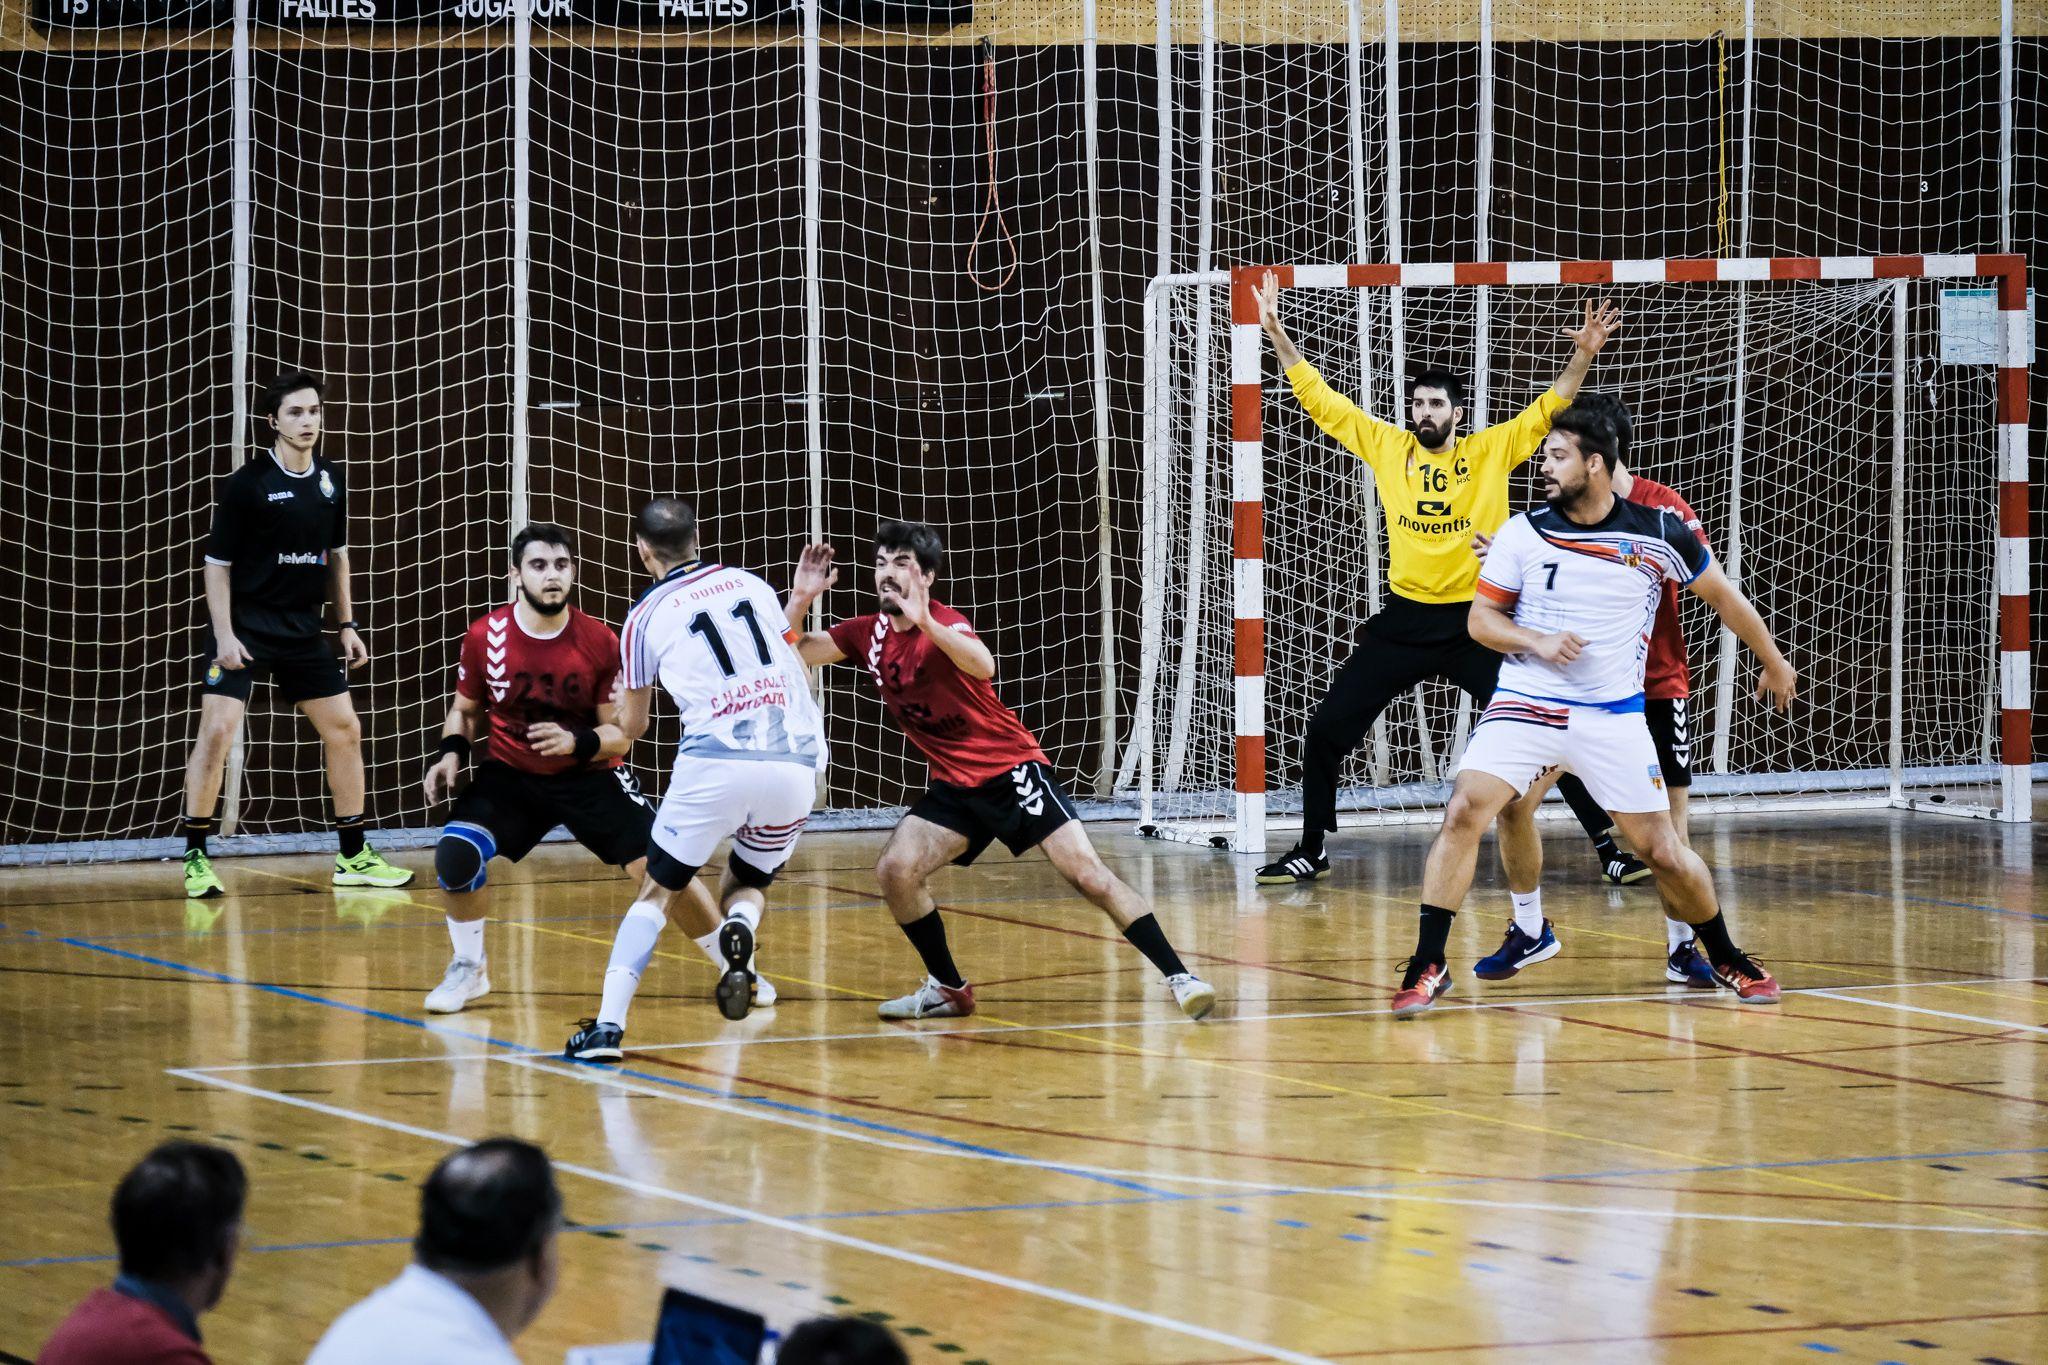 Partit 1a Nacional el C.H. Sant Cugat  contra C.H. La Salle Montcada. FOTO: Ale Gómez